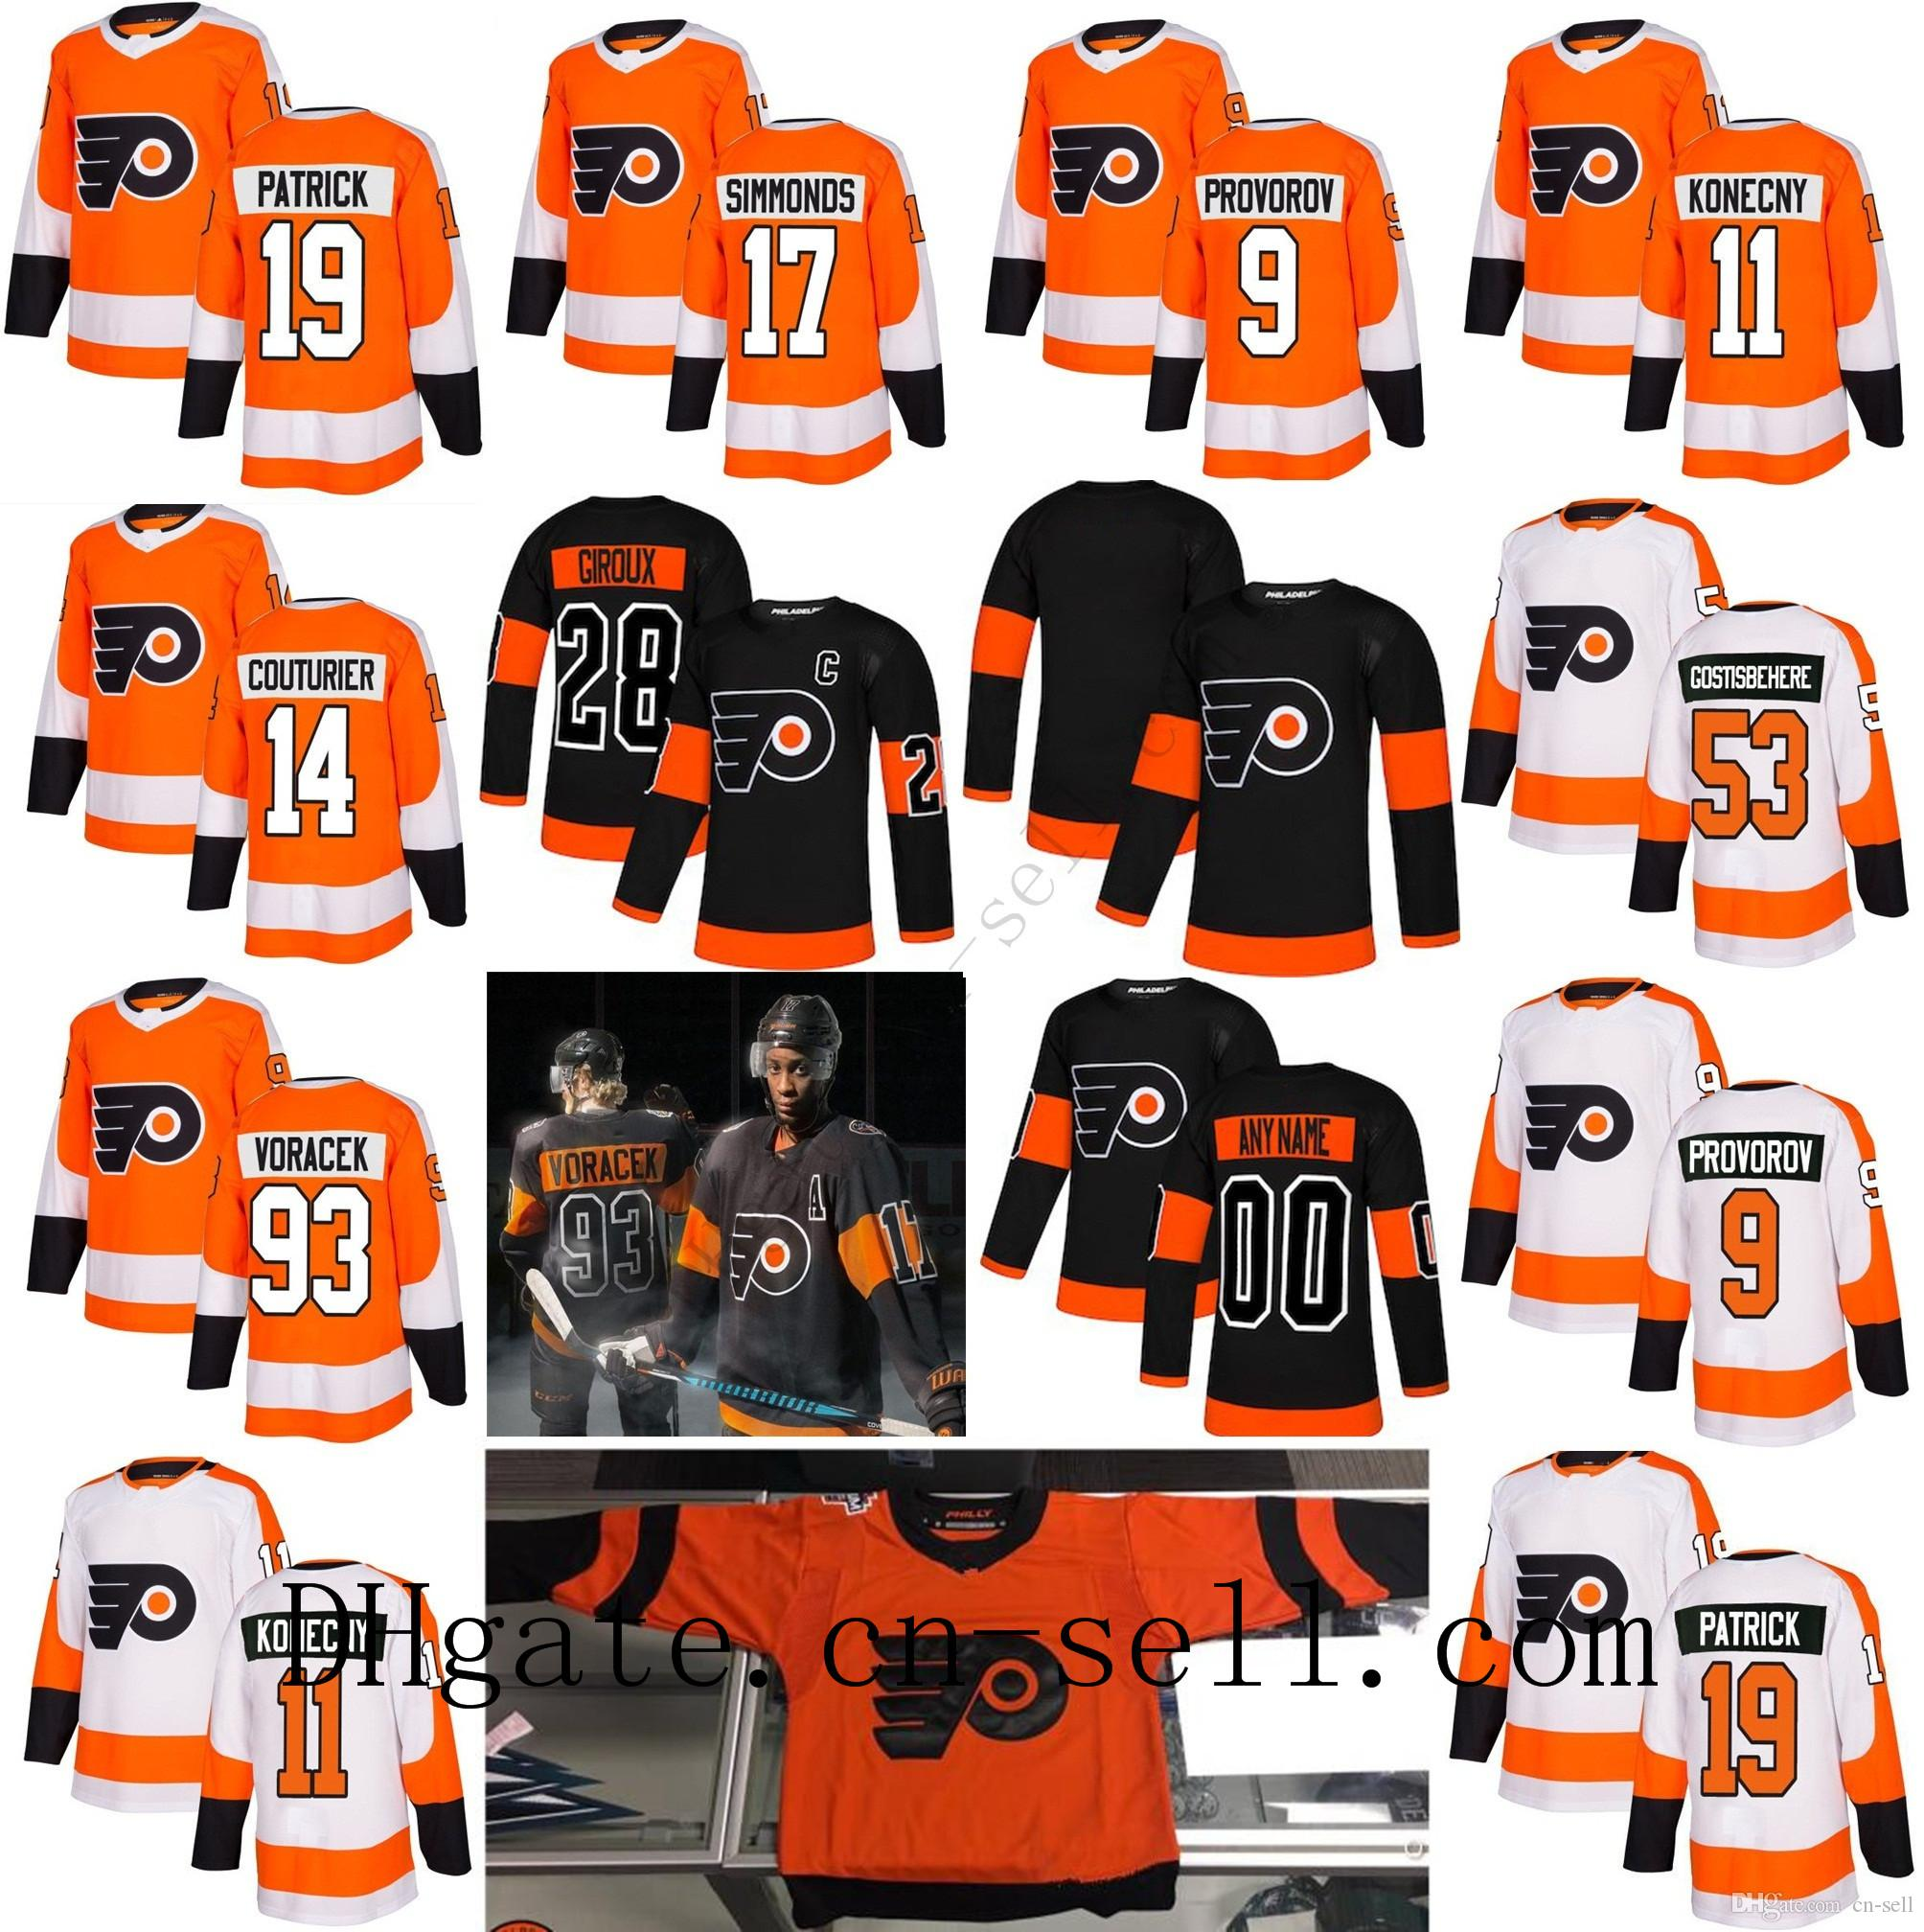 new style 05580 c57f7 2019 Stadium Series Philadelphia Flyers 53 Shayne Gostisbehere Wayne  Simmonds Claude Giroux Jakub Voracek Provorov Konecny Hockey Jersey